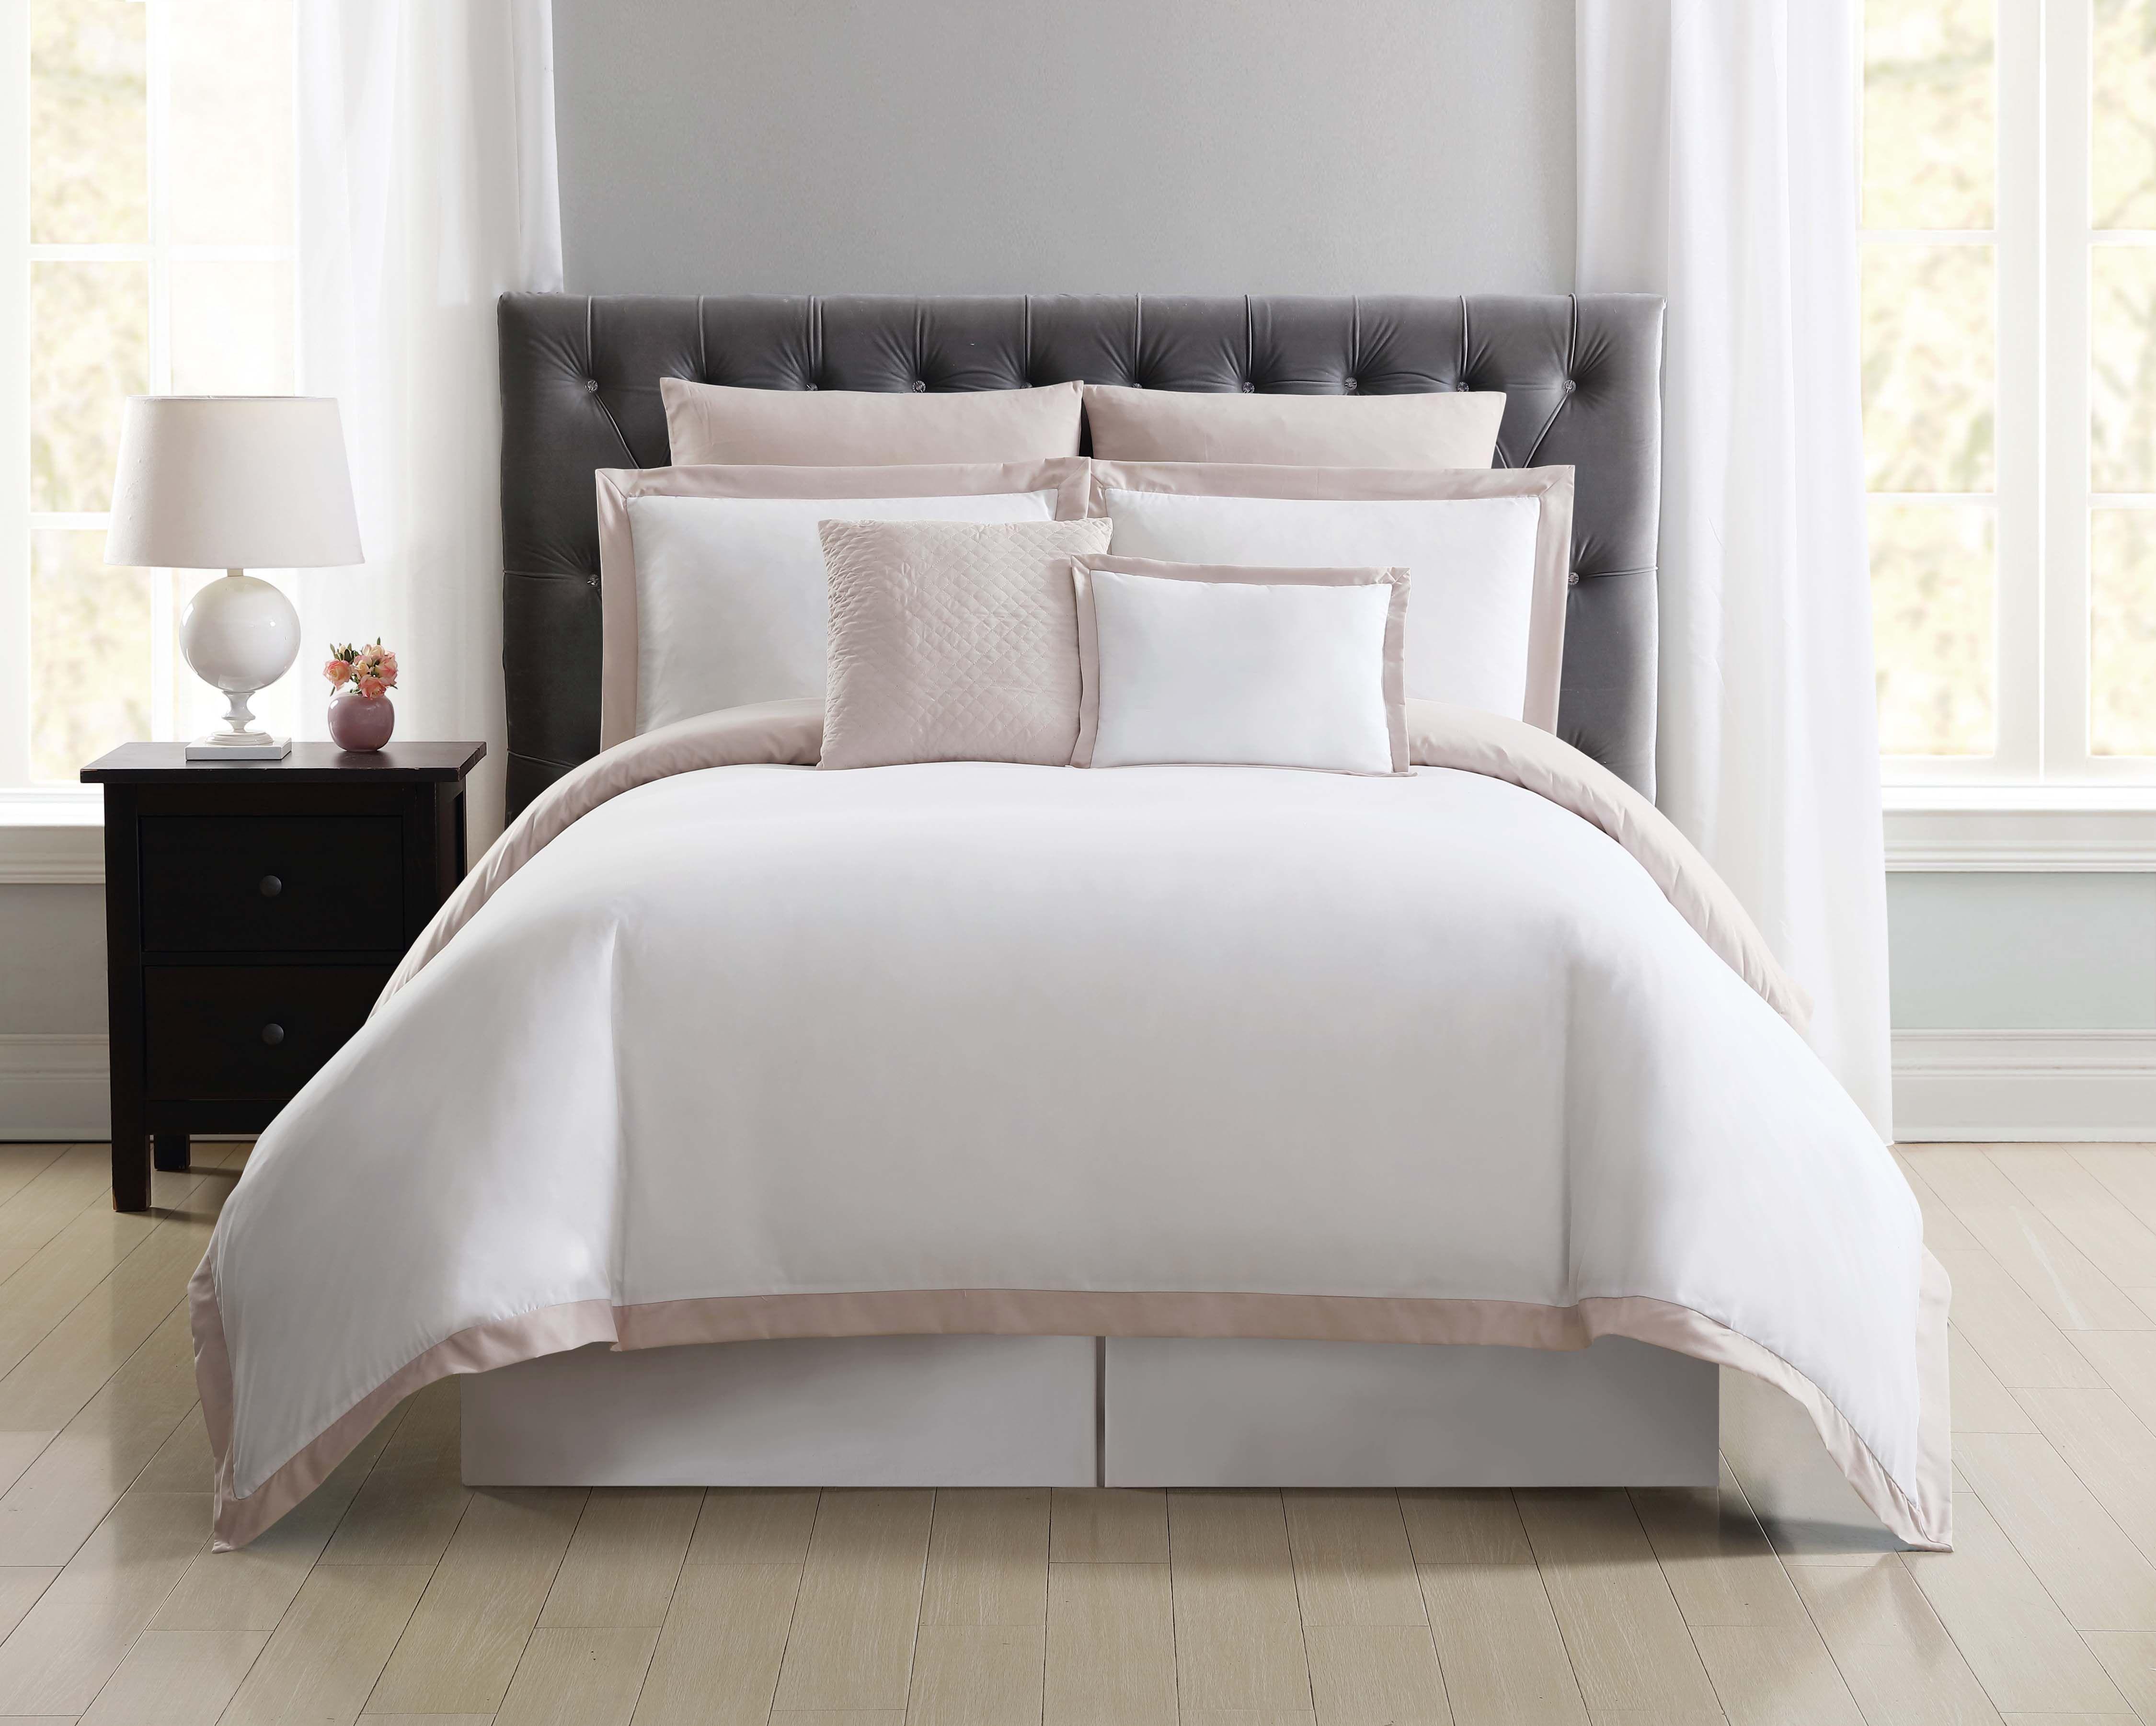 Truly Soft Everyday Hotel Duvet Set, White and Blush